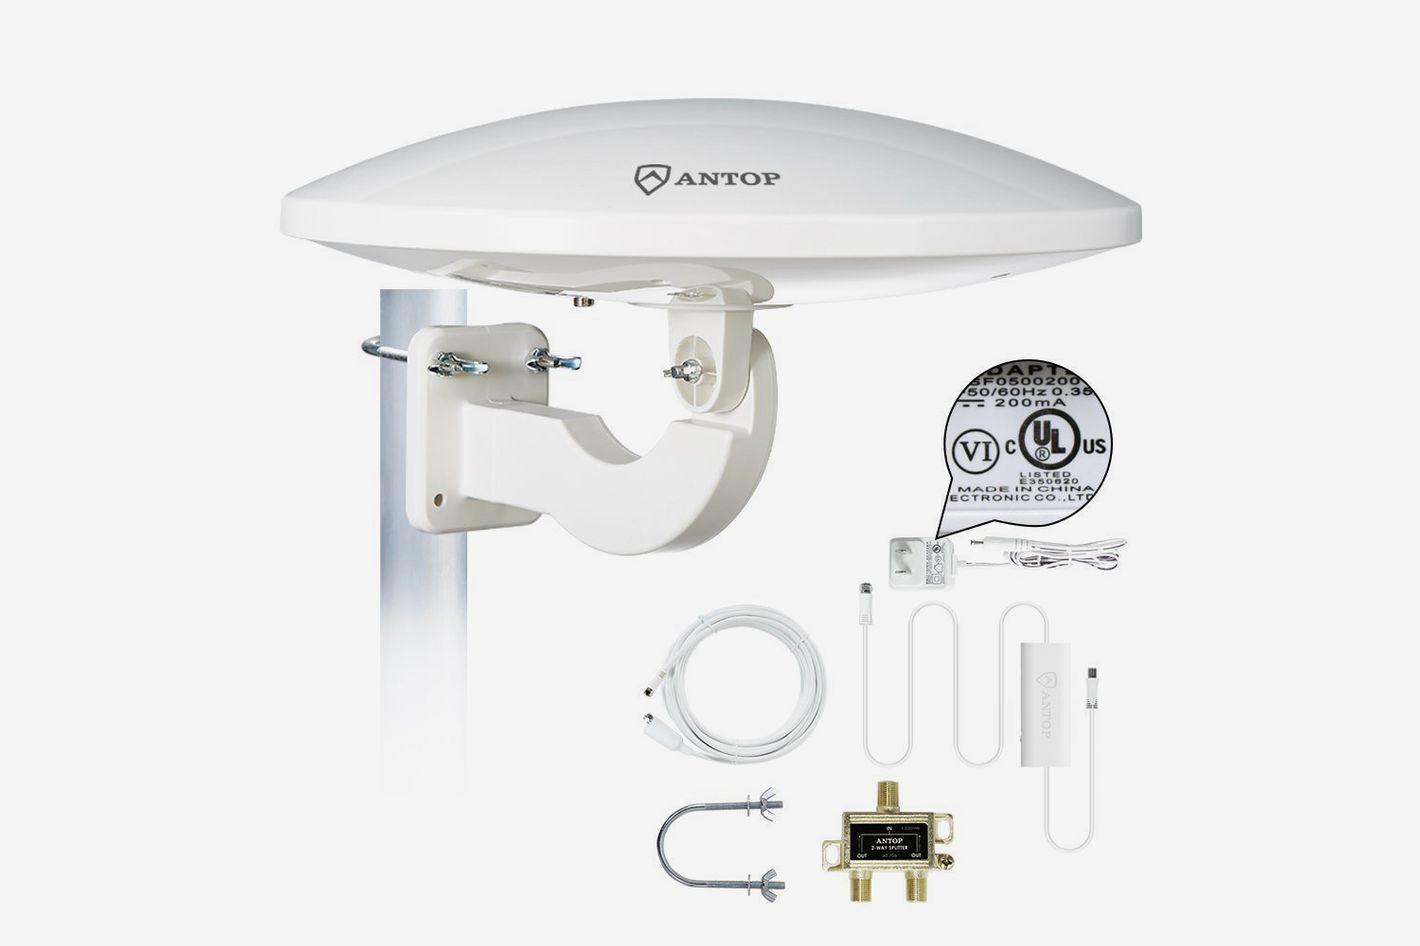 ANTOP UFO Amplified HDTV Antenna